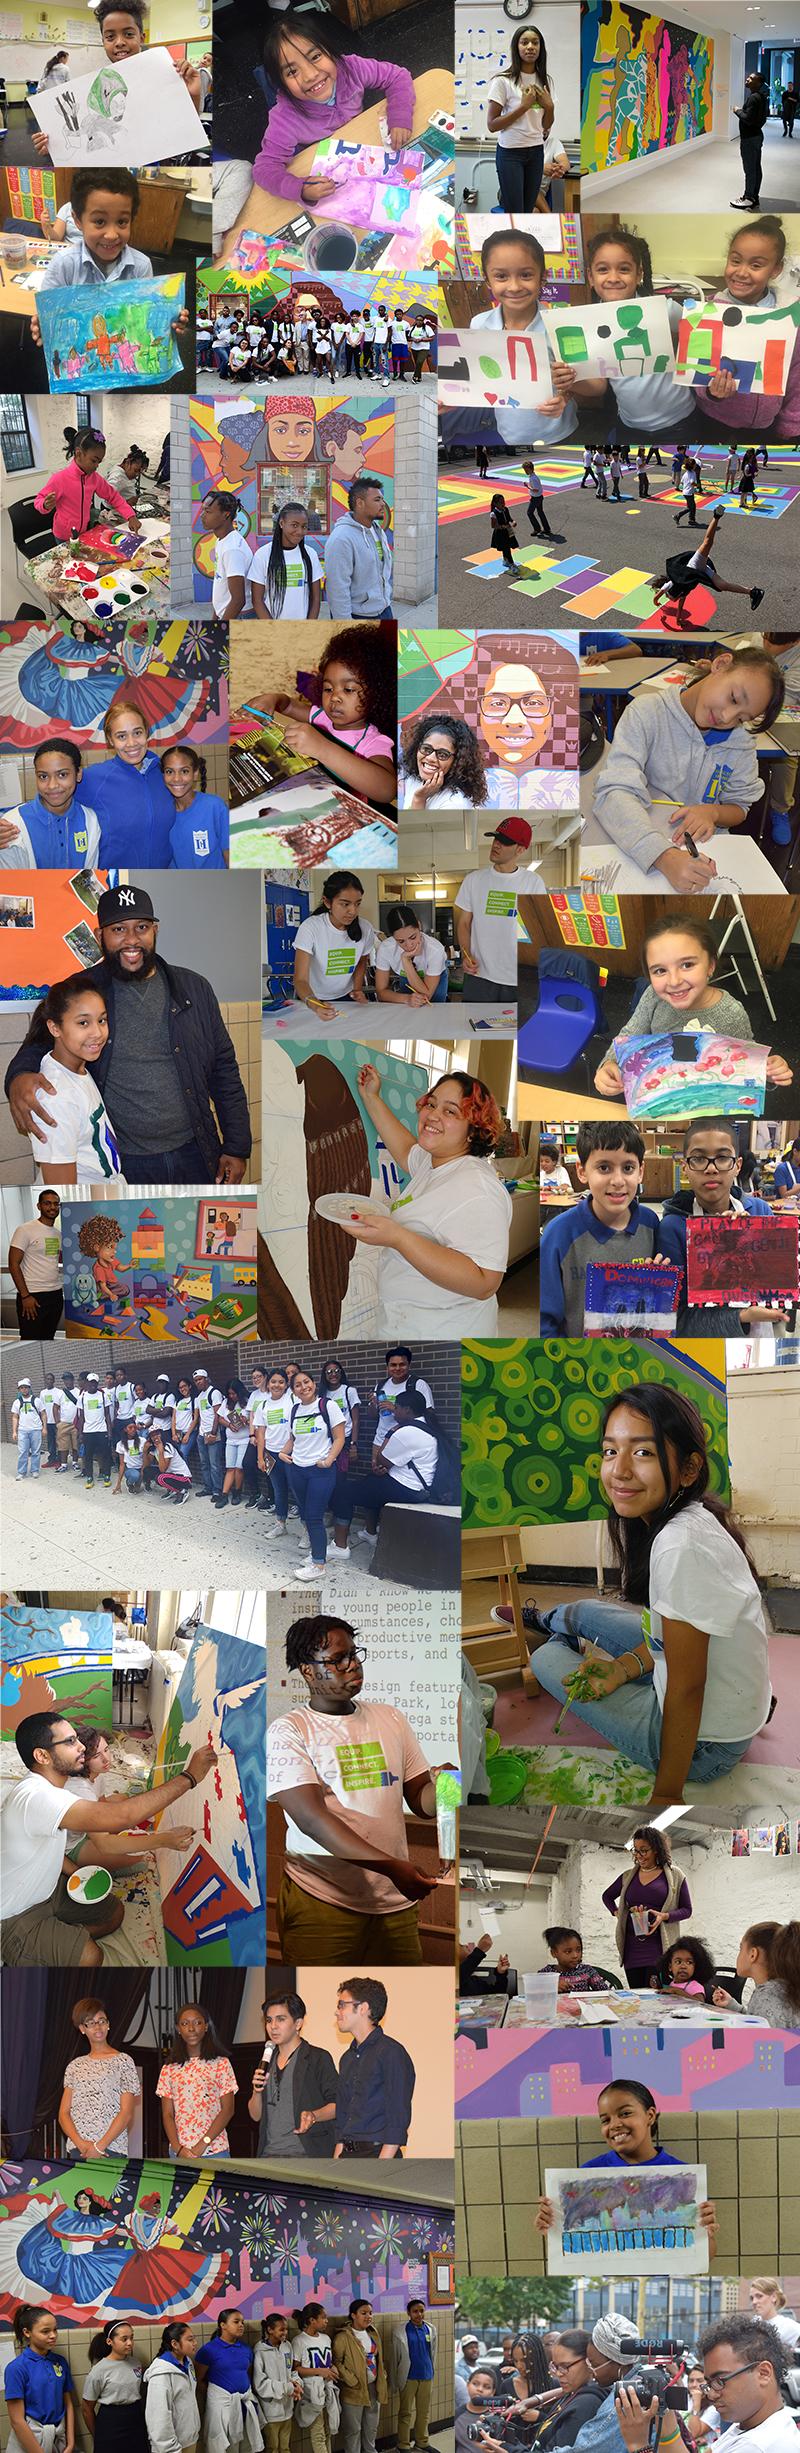 annual appeal 3 key image.jpg